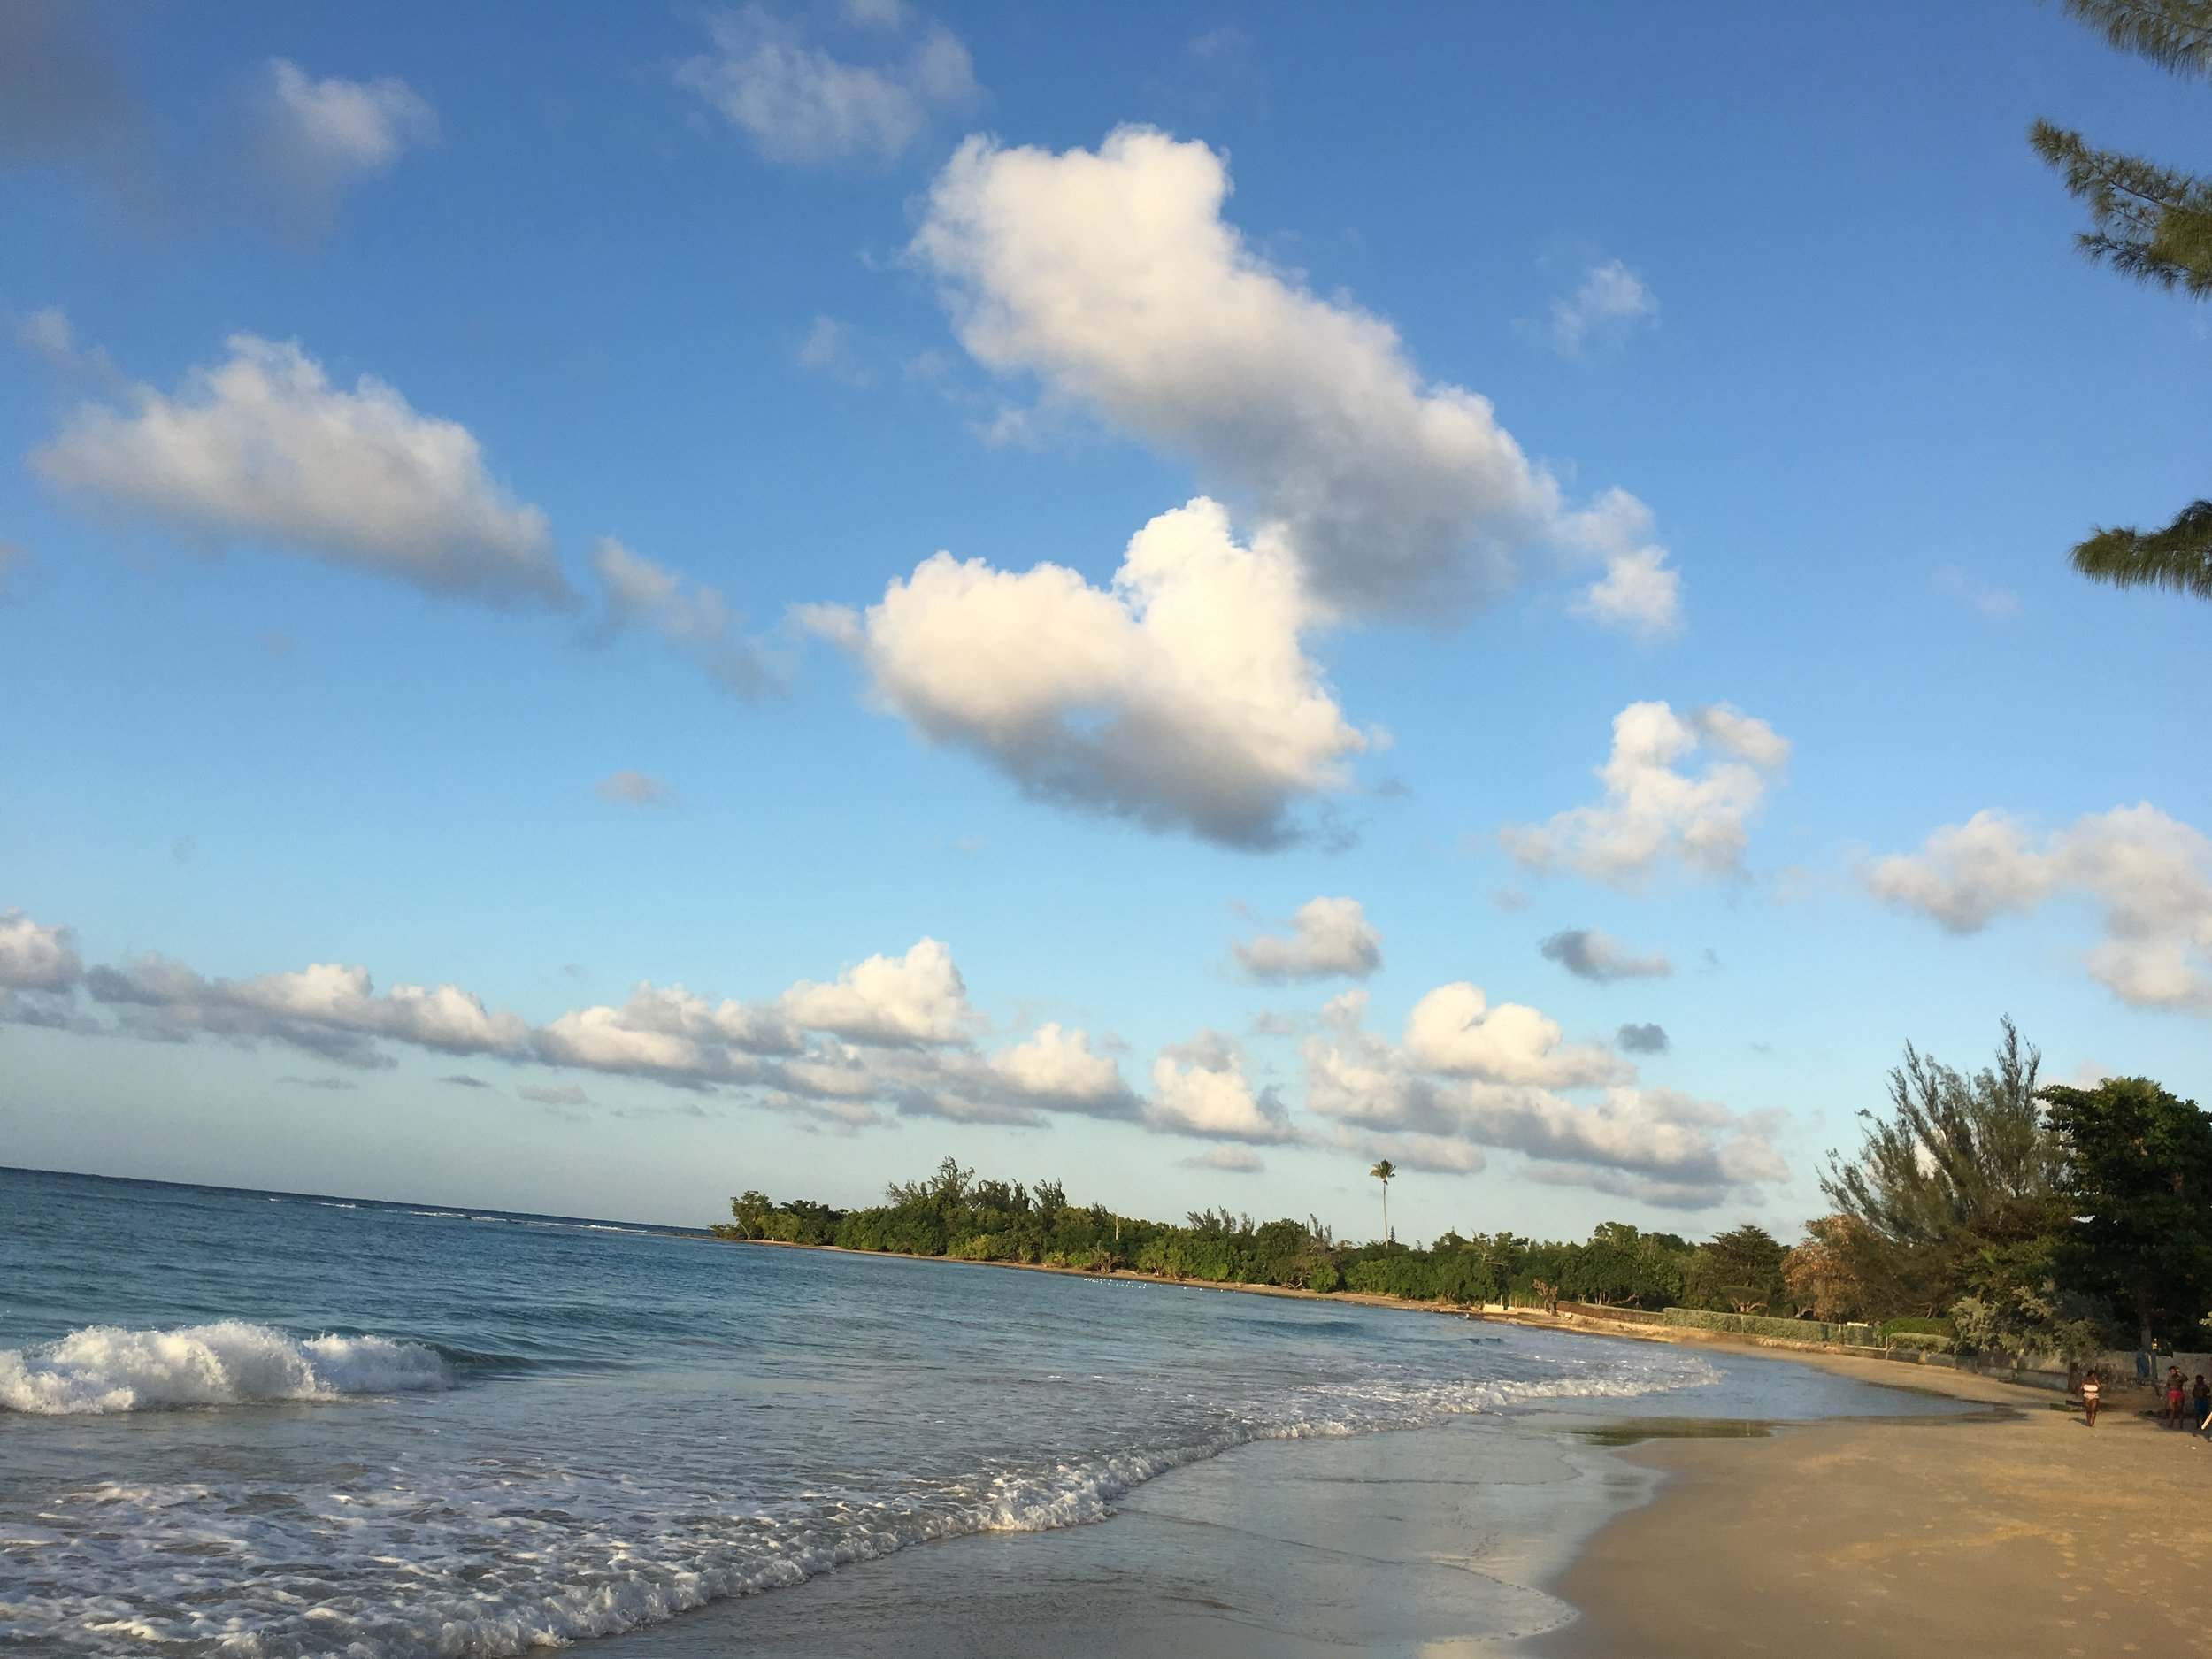 Siesta_Runaway_Bay_Jamaica_Beach.JPG